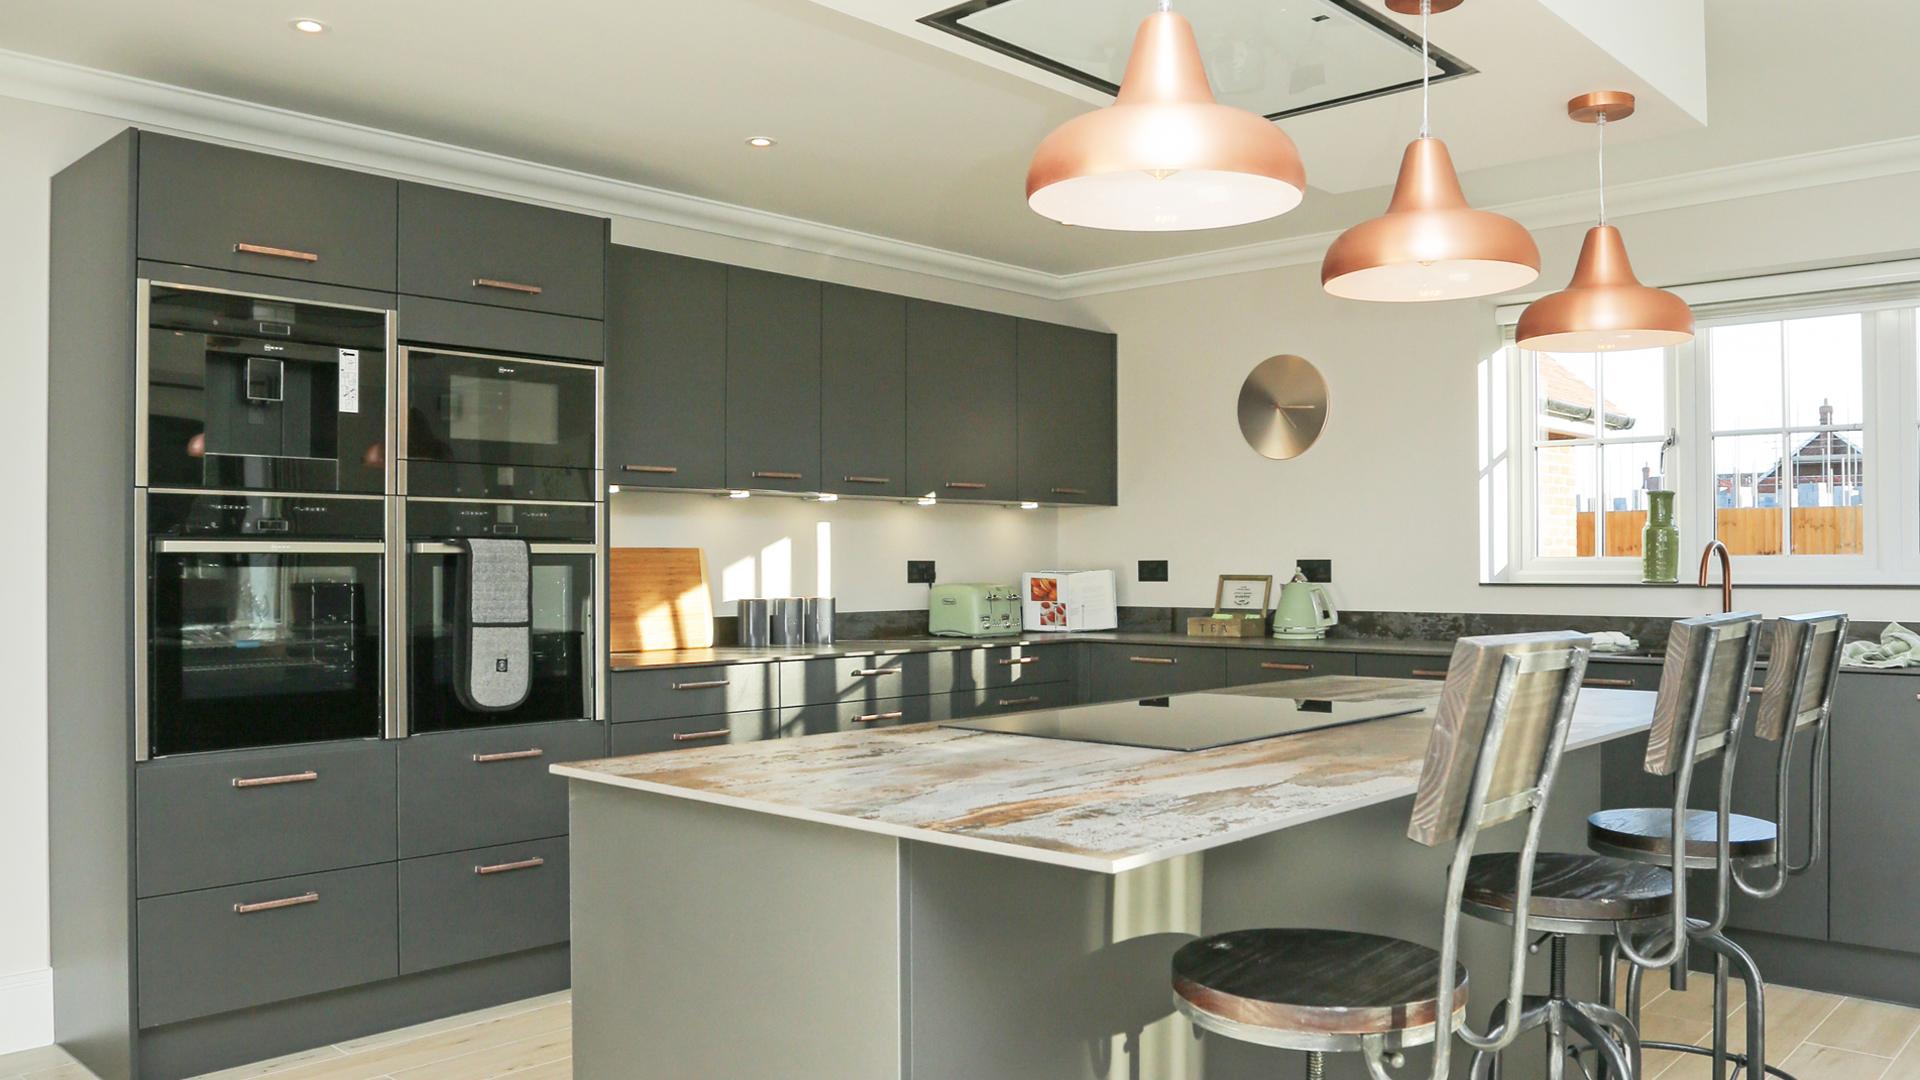 A Kitchen at Weavers Park